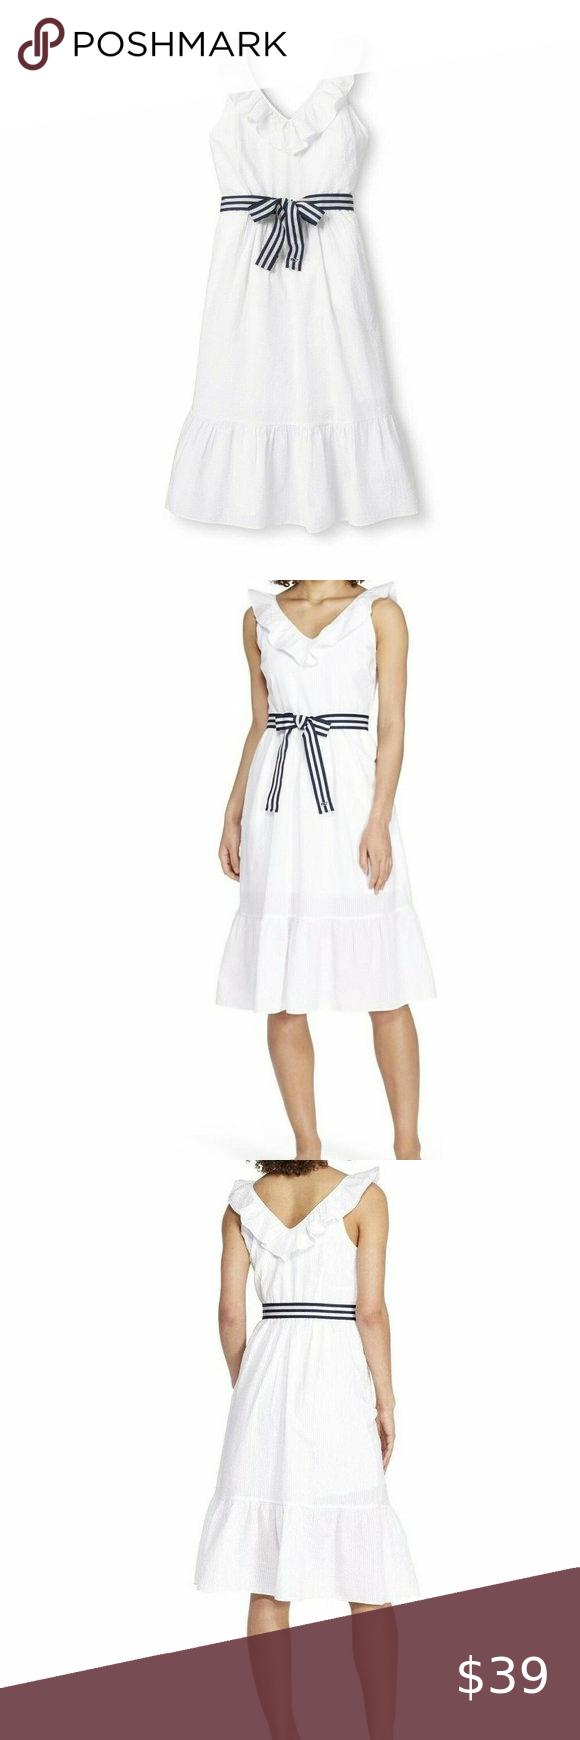 Vineyard Vines For Target Dress Ruffle Tie White M Women S Sleeveless Ruffle Tie Waisted Midi V Neck Dress White Vineya Target Dresses Ruffle Dress Dresses [ 1740 x 580 Pixel ]